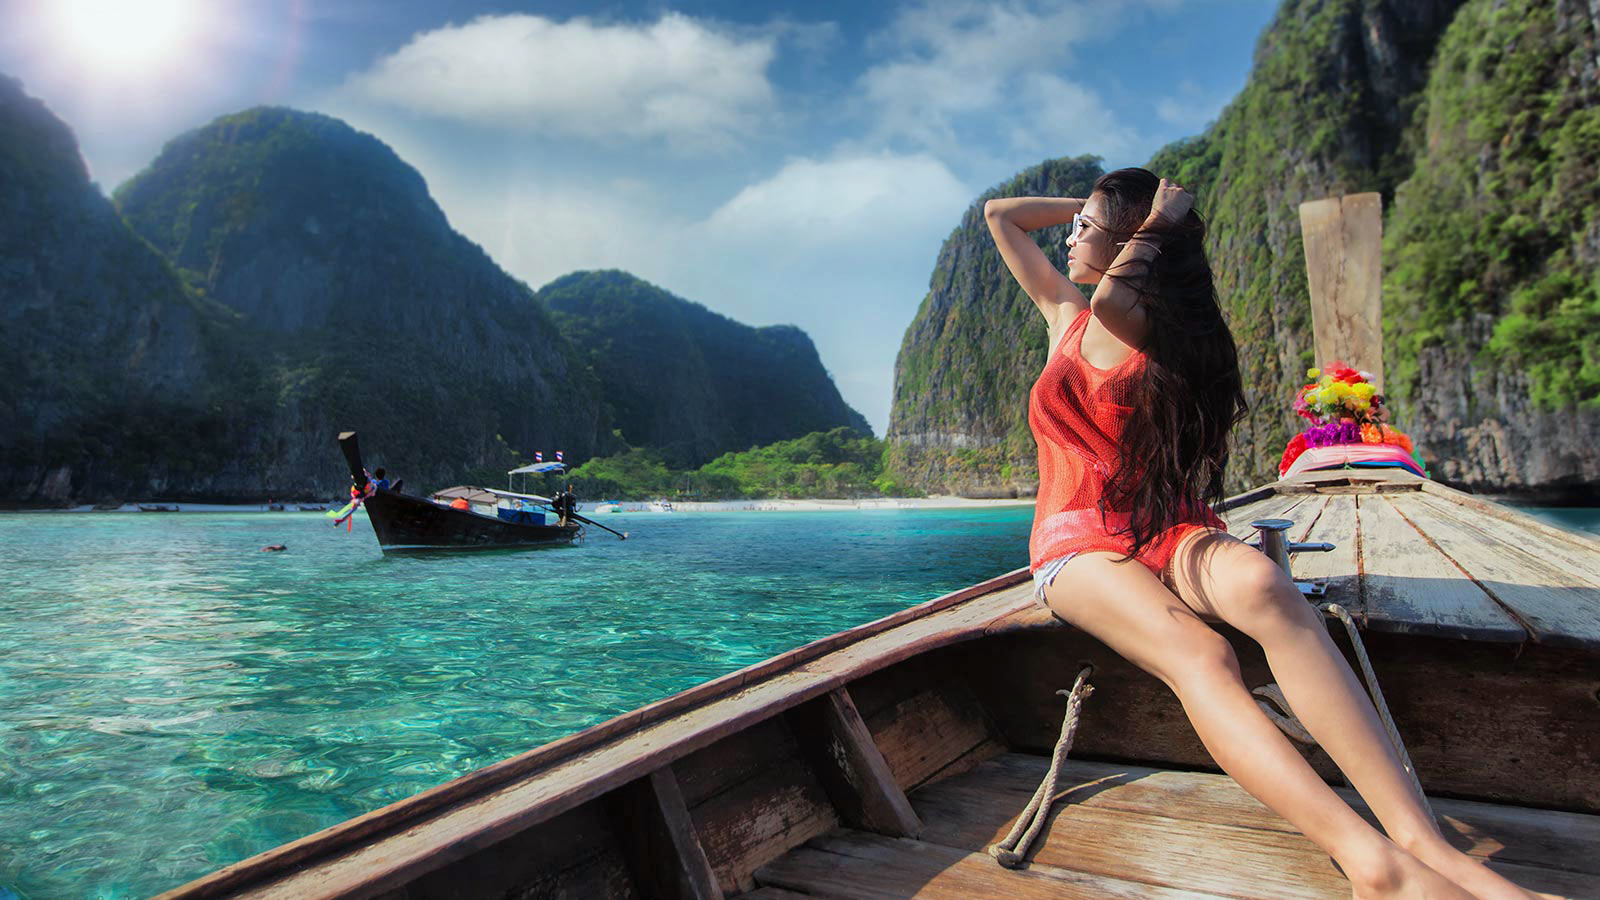 Boat Trip to Phi Phi Islands, Ayurveda, Wellness, Yoga Retreats, Phuket Thailand, Mangosteen Ayurveda & Wellness Resort, Number 1 Ayurveda Resort in Thailand, Rawai, Phuket.